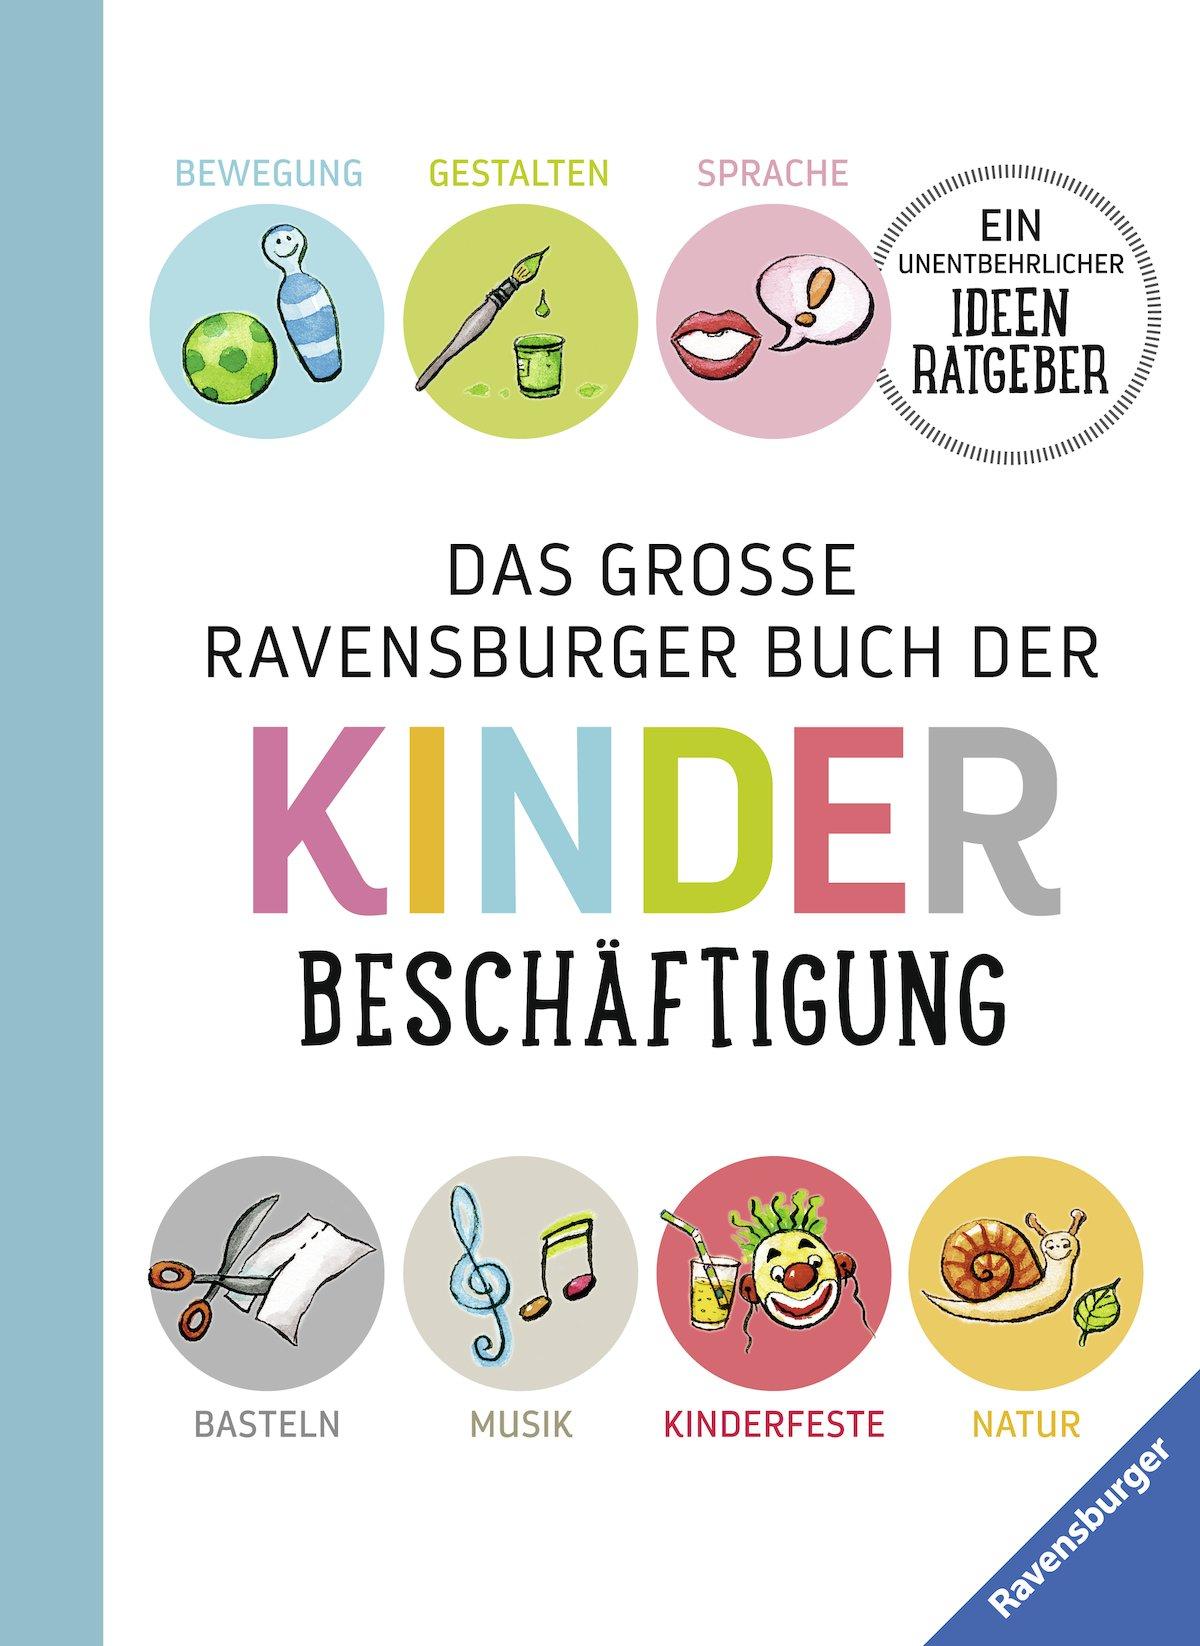 Das große Ravensburger Buch der Kinderbeschäftigung: Amazon.de: Bertrun  Jeitner-Hartmann, Helga Braemer, Renate Falk, Kraft Geer, Edith Harries, ...